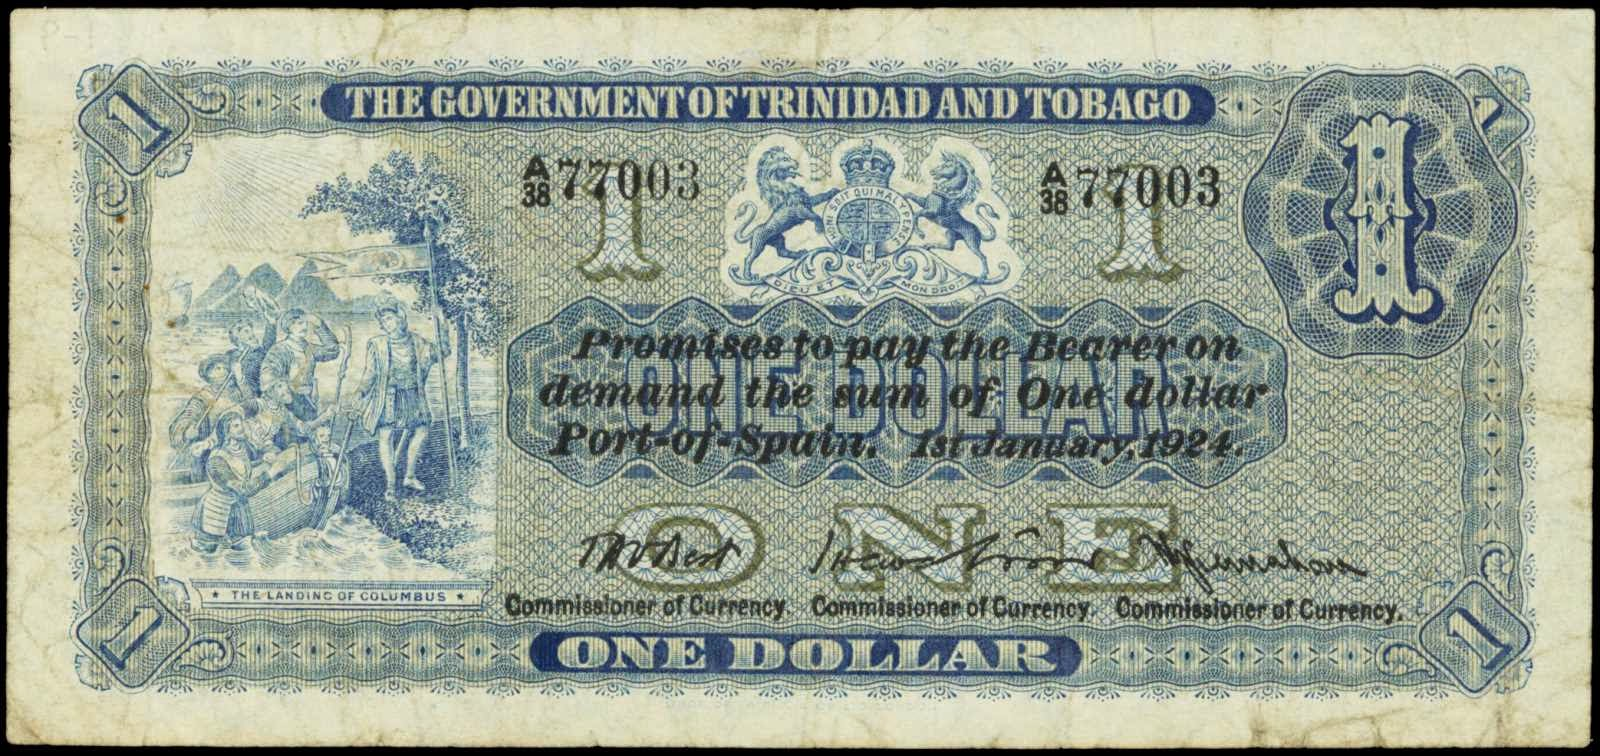 worksheet Trinidad Currency trinidad and tobago one dollar banknote 1924world banknotes 1924